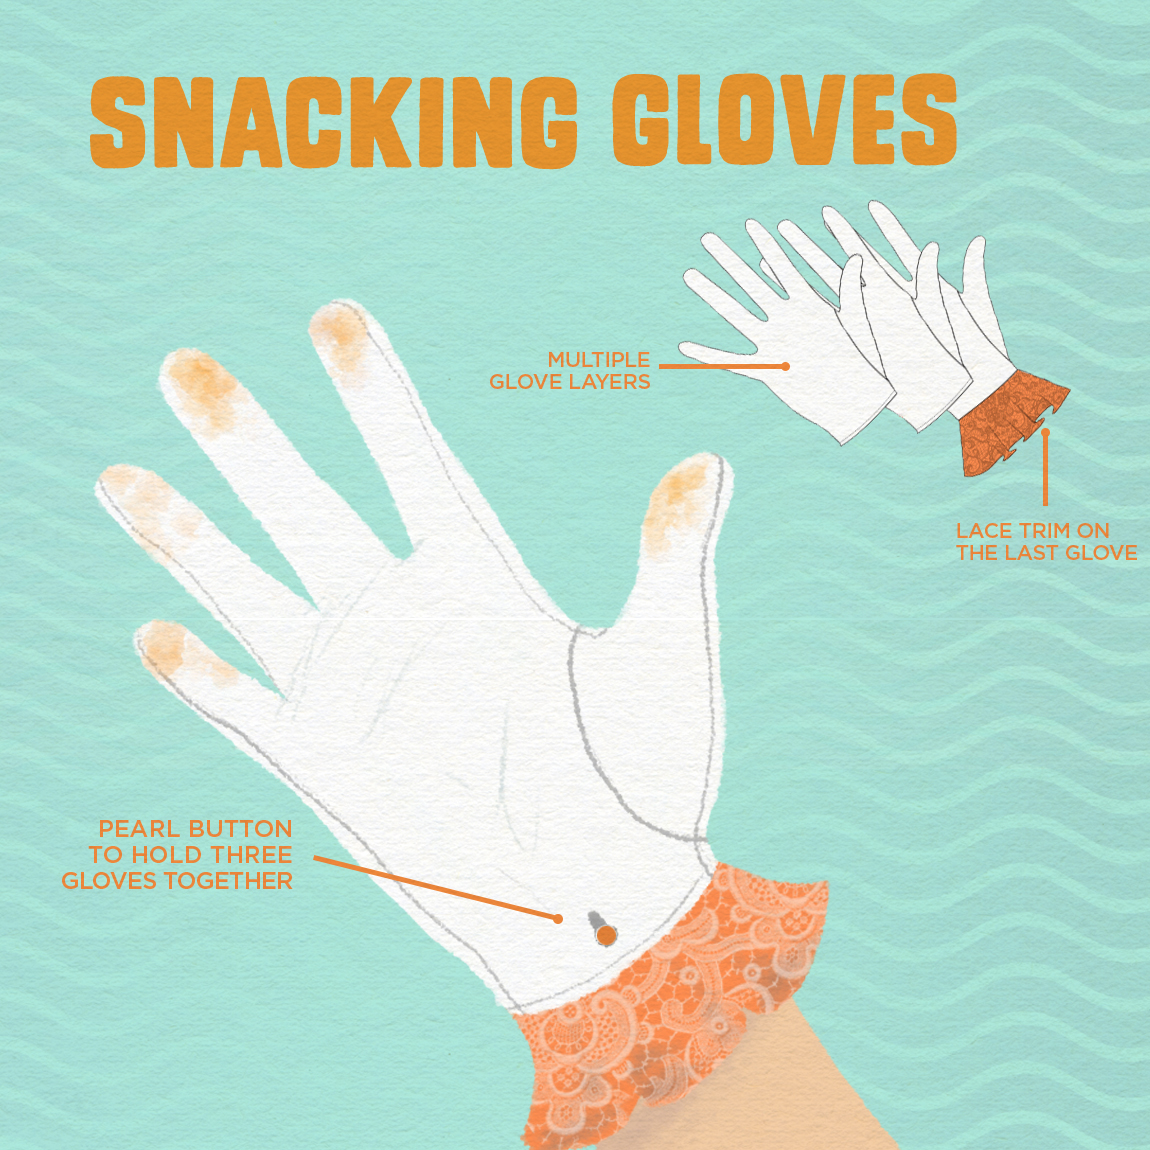 58cc8129f0f0114074-Cheetos-Snacking-Gloves-2.jpg